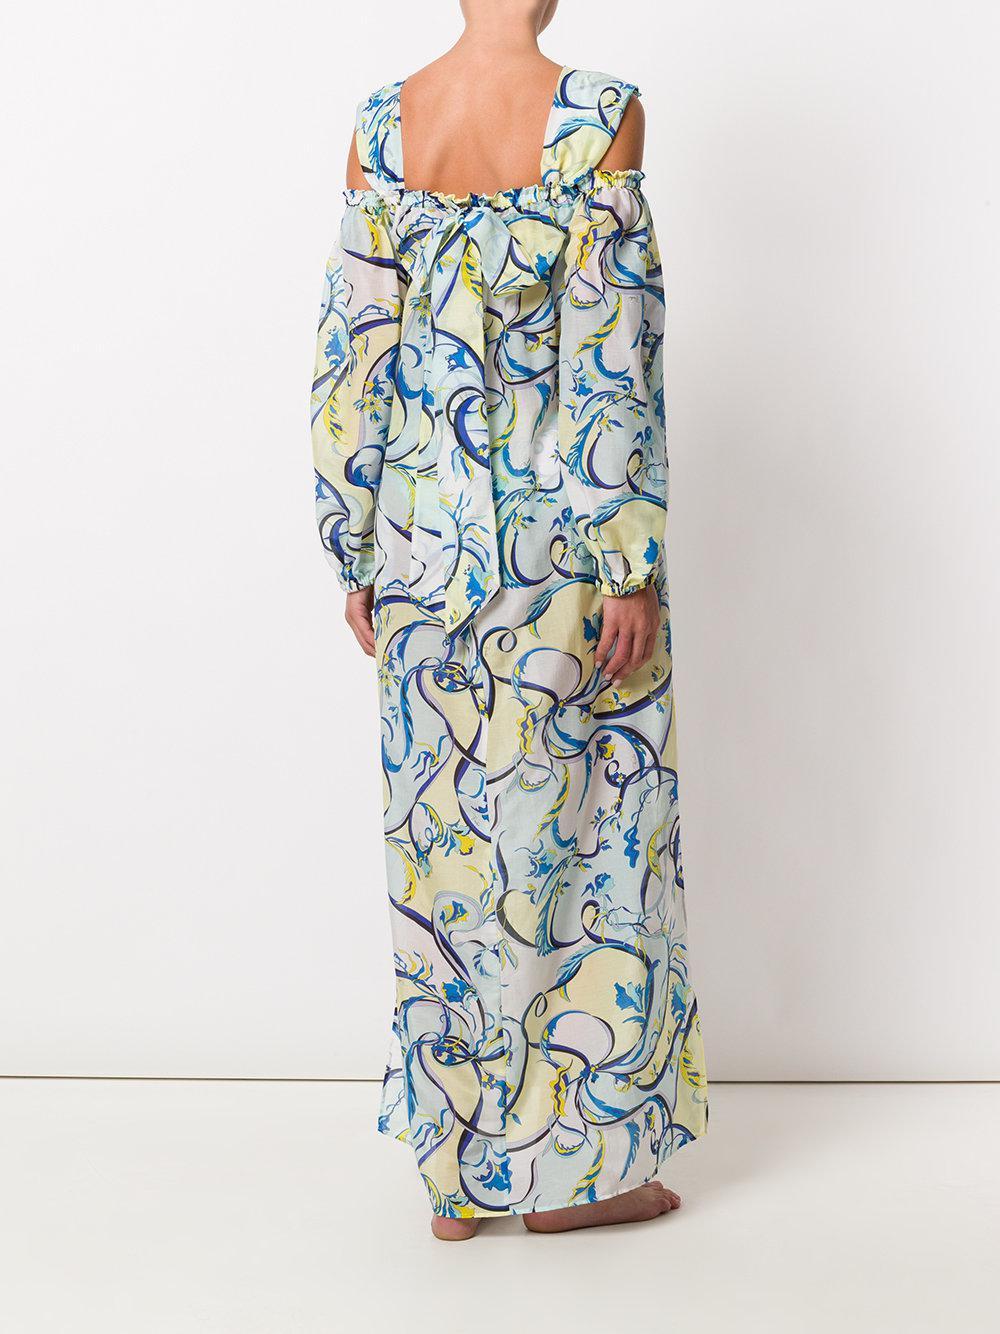 Emilio Pucci cold-shoulder printed maxi dress Discount Prices 2RndUrF